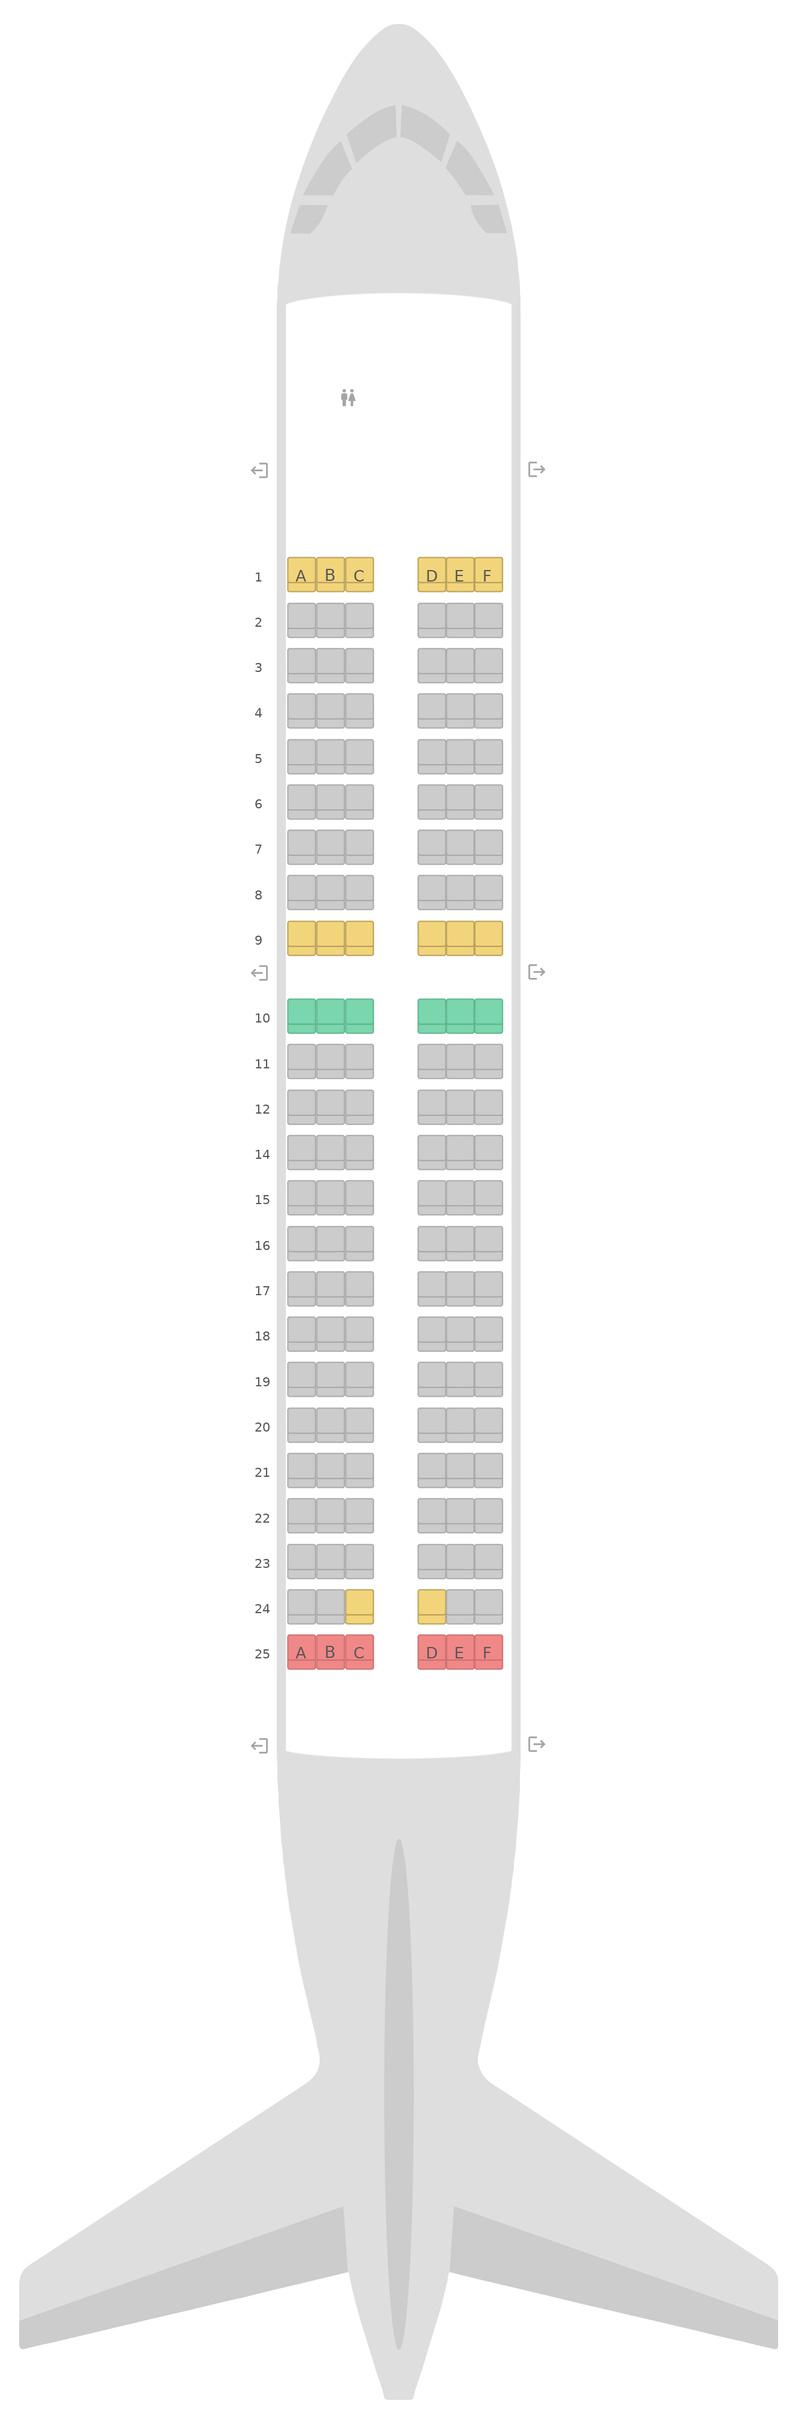 Mapa de asientos Airbus A319 v1 British Airways